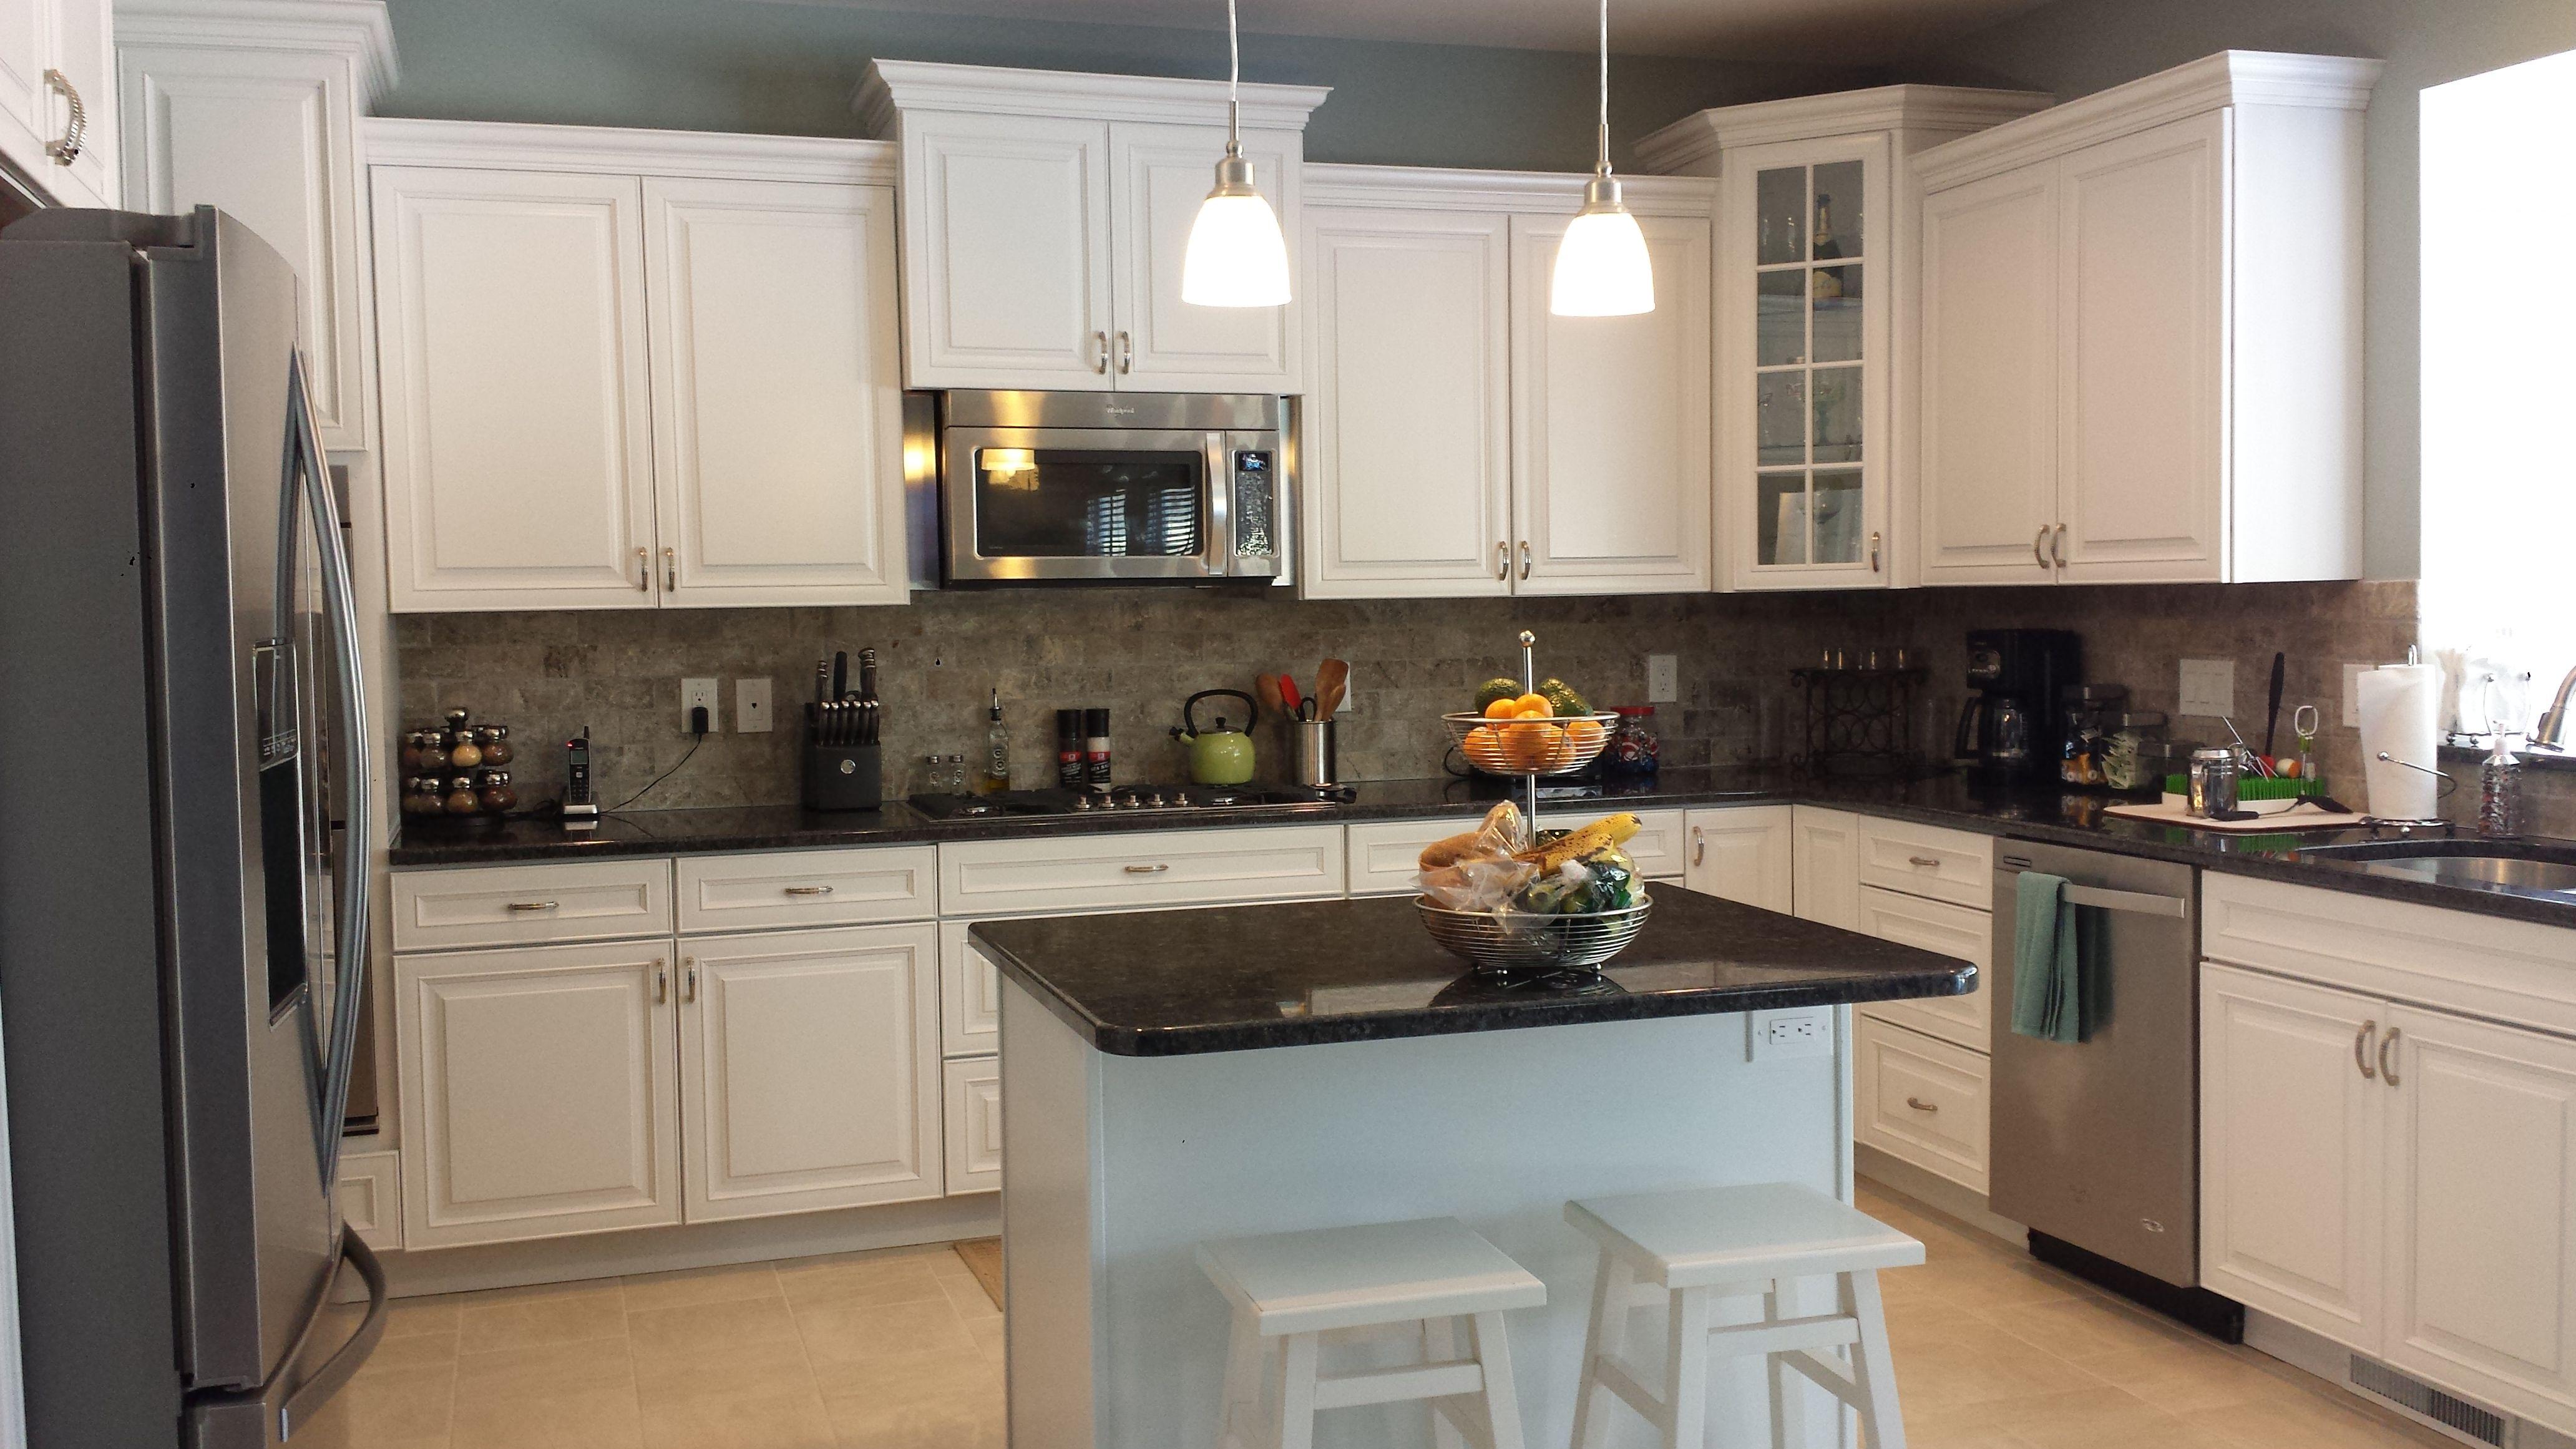 Good Streater Kitchen Designed By Thomas Matteo #kitchen #kraftmaid #cabinets  #microwave #granite